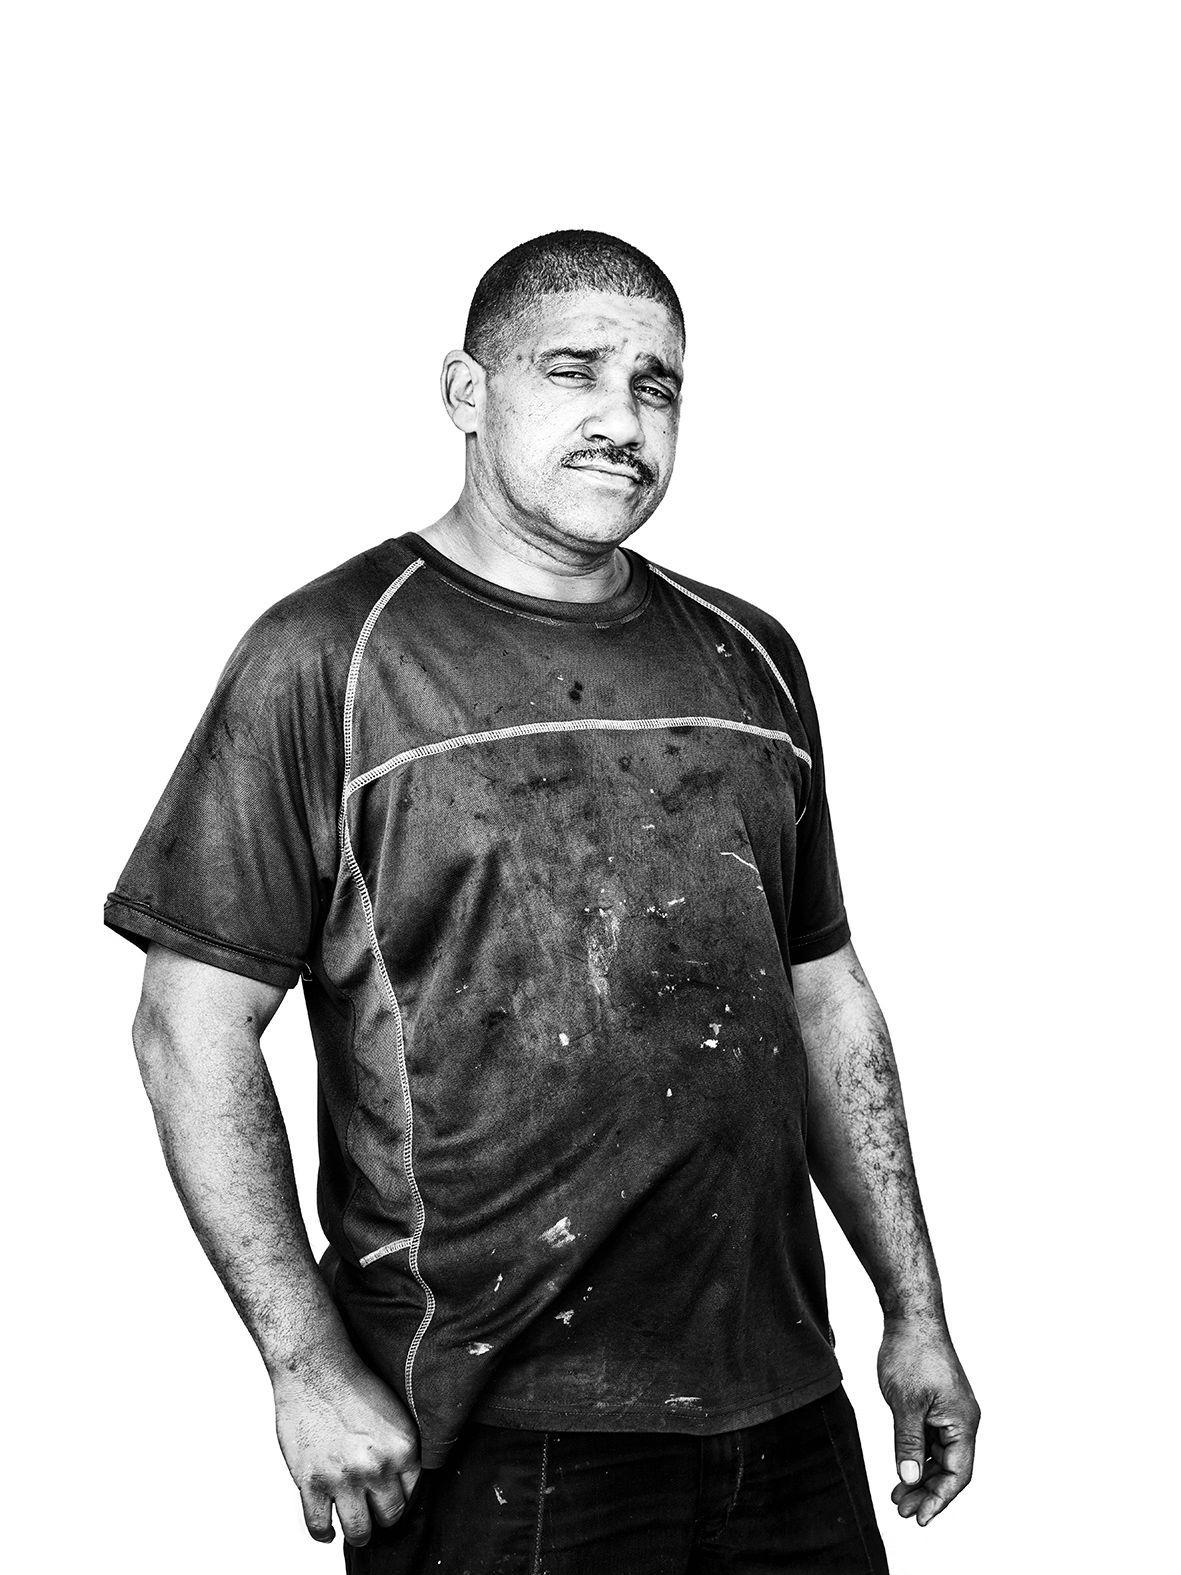 Portrait of Melkom, my head mechanic in Grassy park.